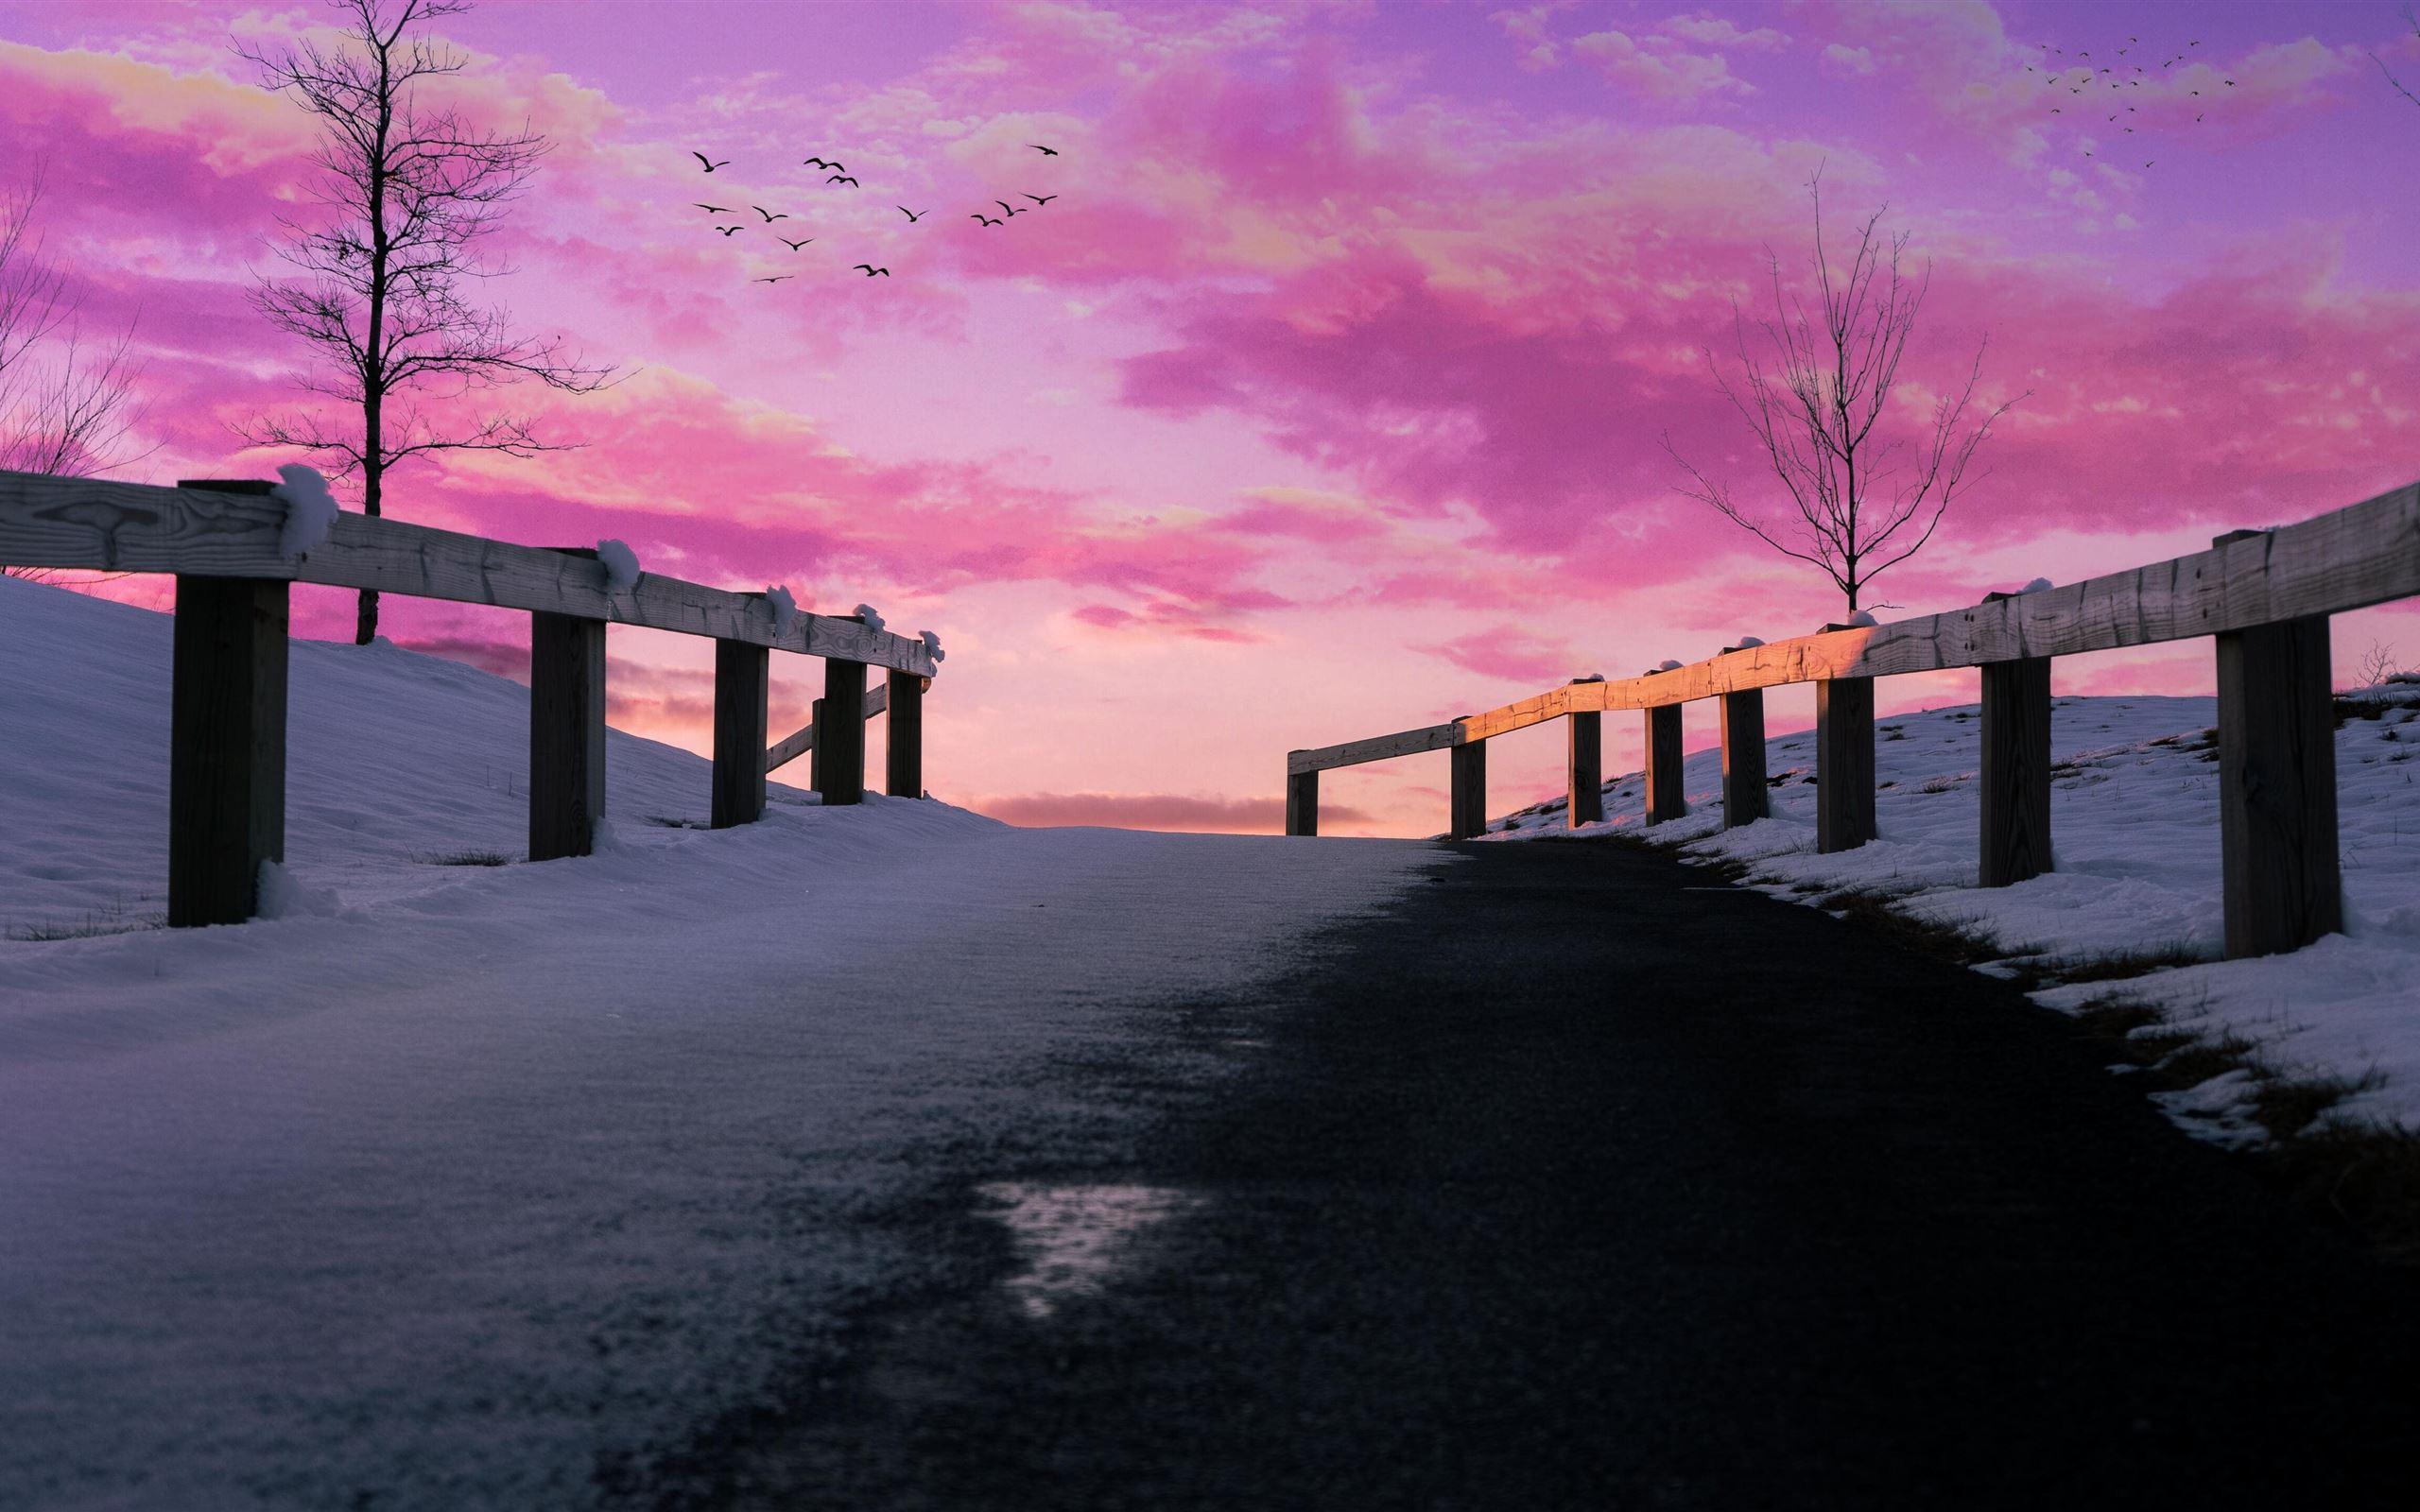 Aesthetics Pink Pink Sky 5k Imac Wallpaper Download Allmacwallpaper